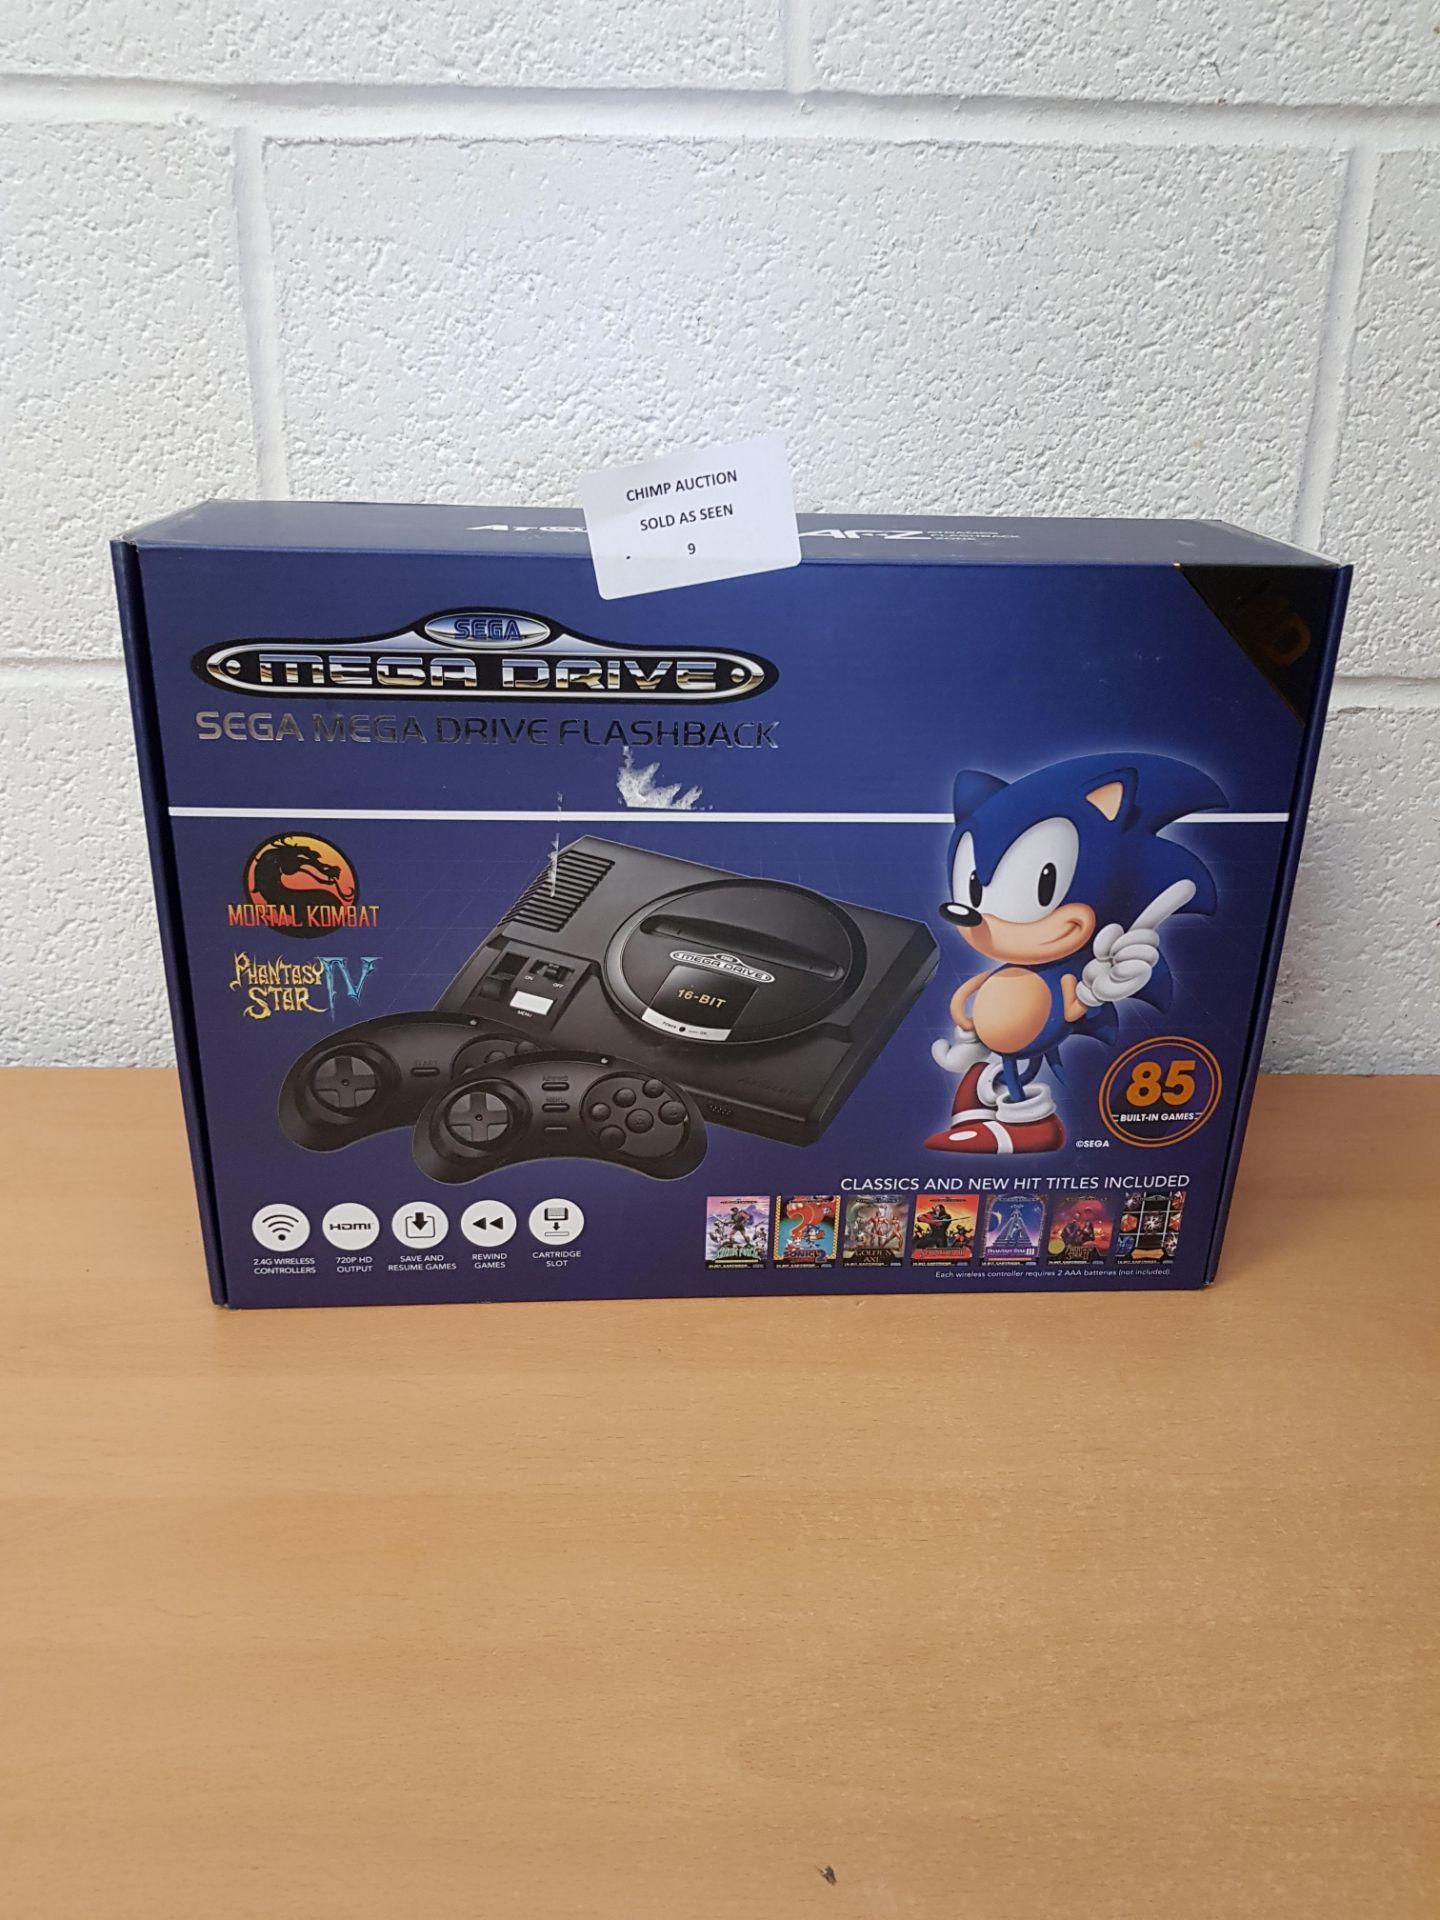 Sega Mega Drive HD Flashback + 85 games retro Console RRP £79.99.